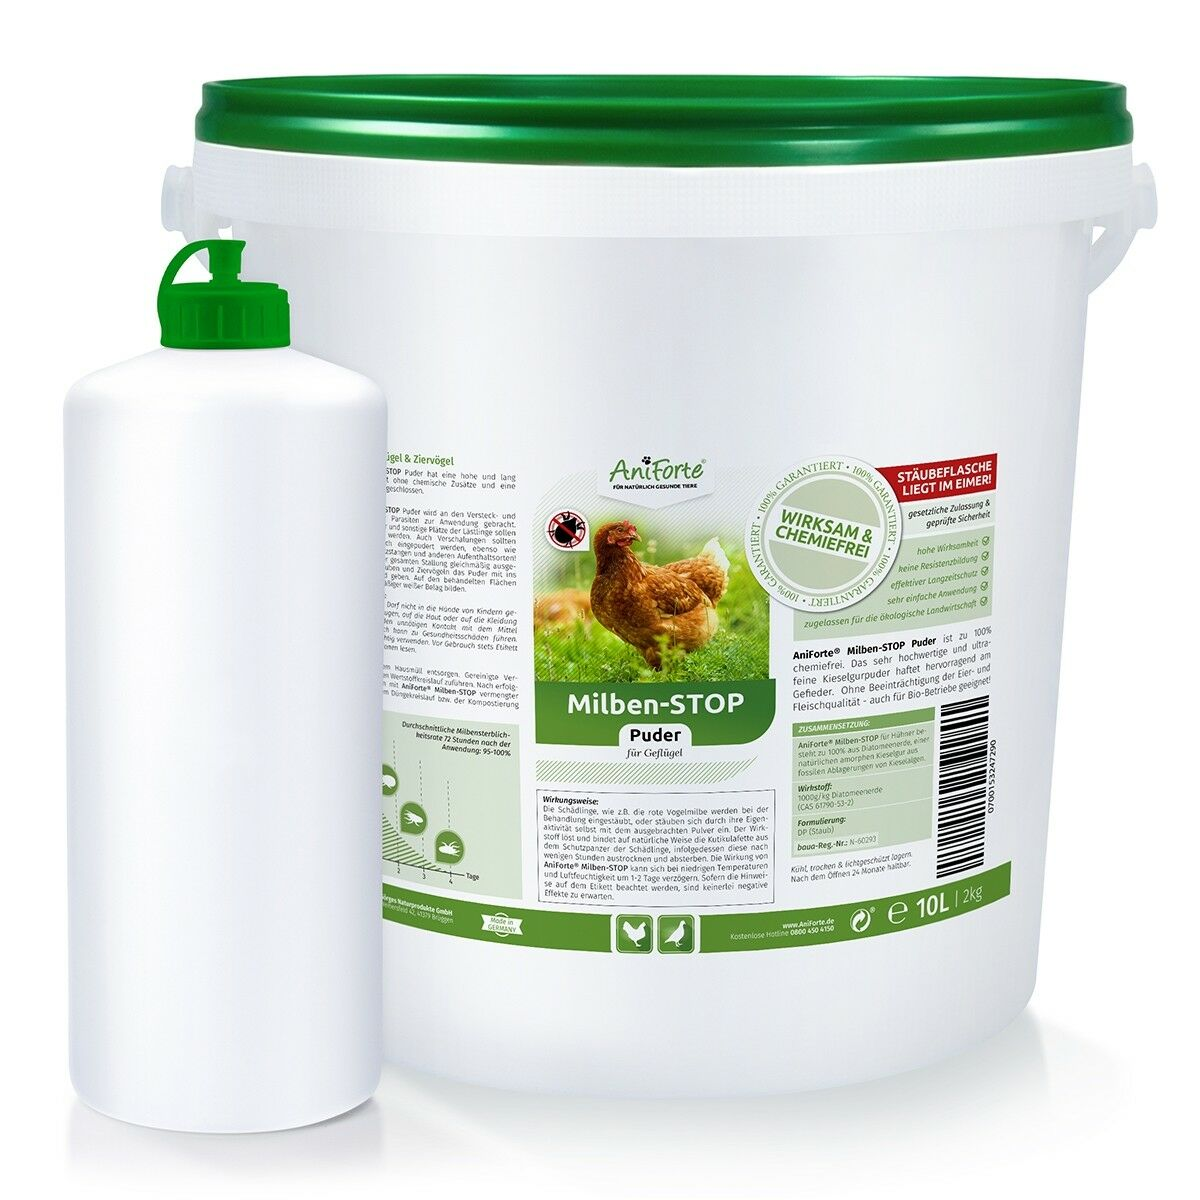 AniForte rede Vogelmilbe Milben Stop-Puder 10 Liter  Kieselgur Hühner, Vögel